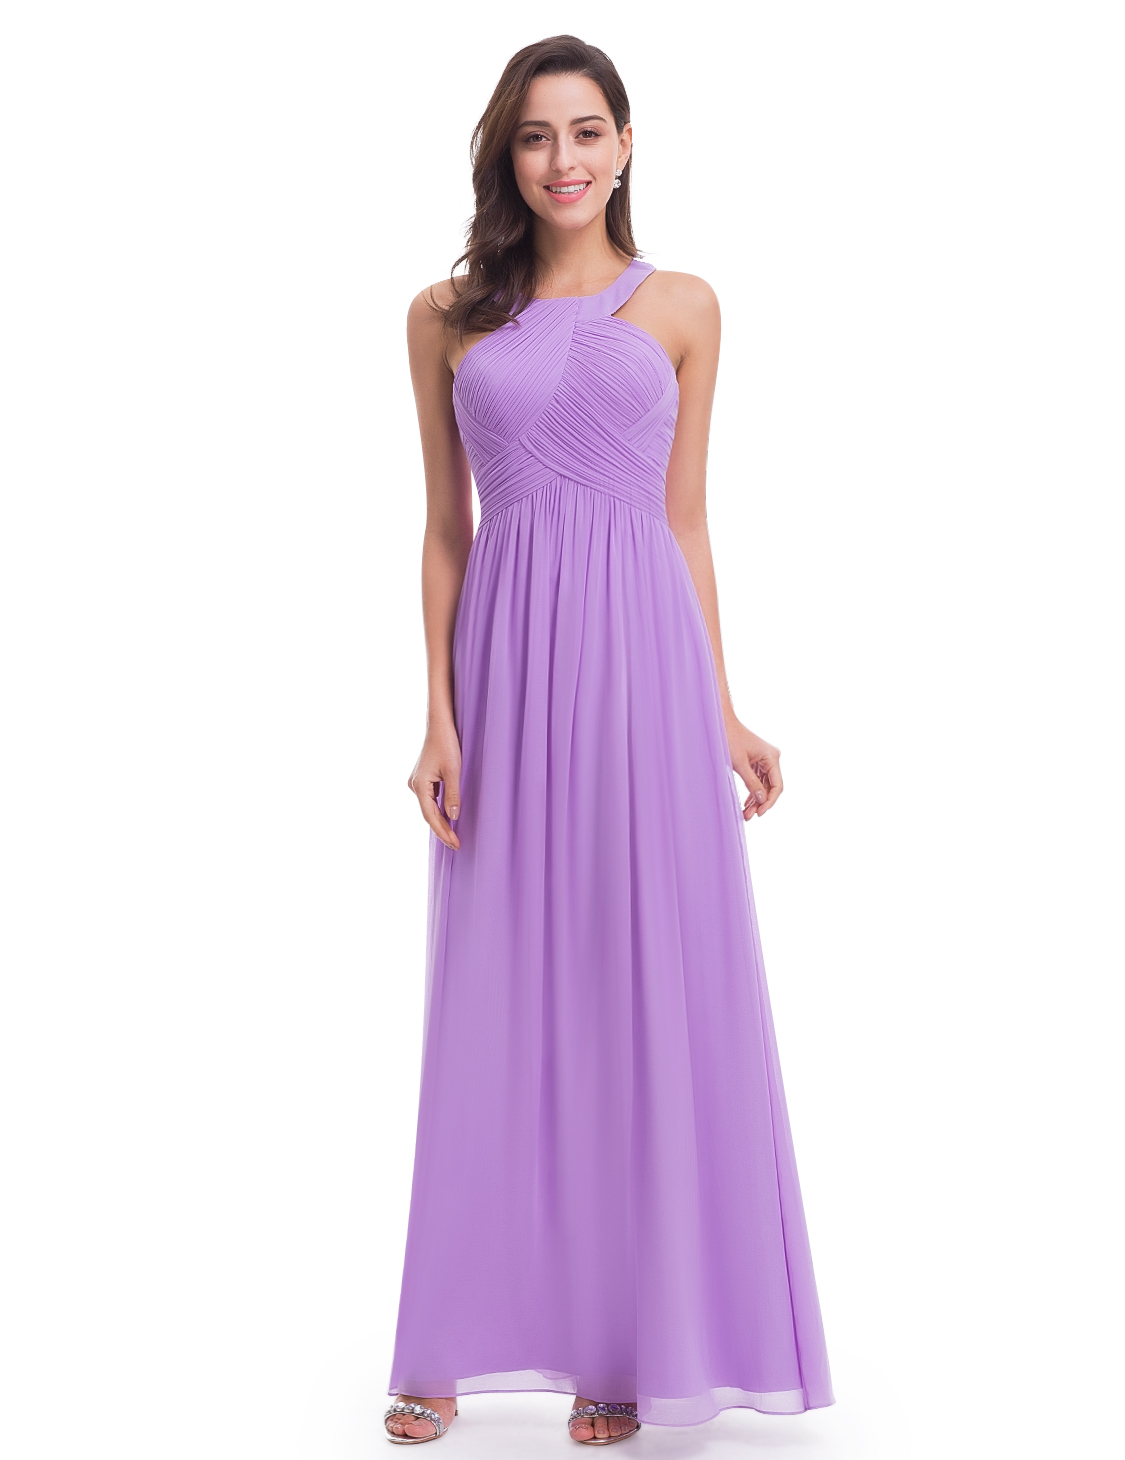 Ever-Pretty 2018 Long Halter Bridesmaid Wedding Dresses Evening Prom ...